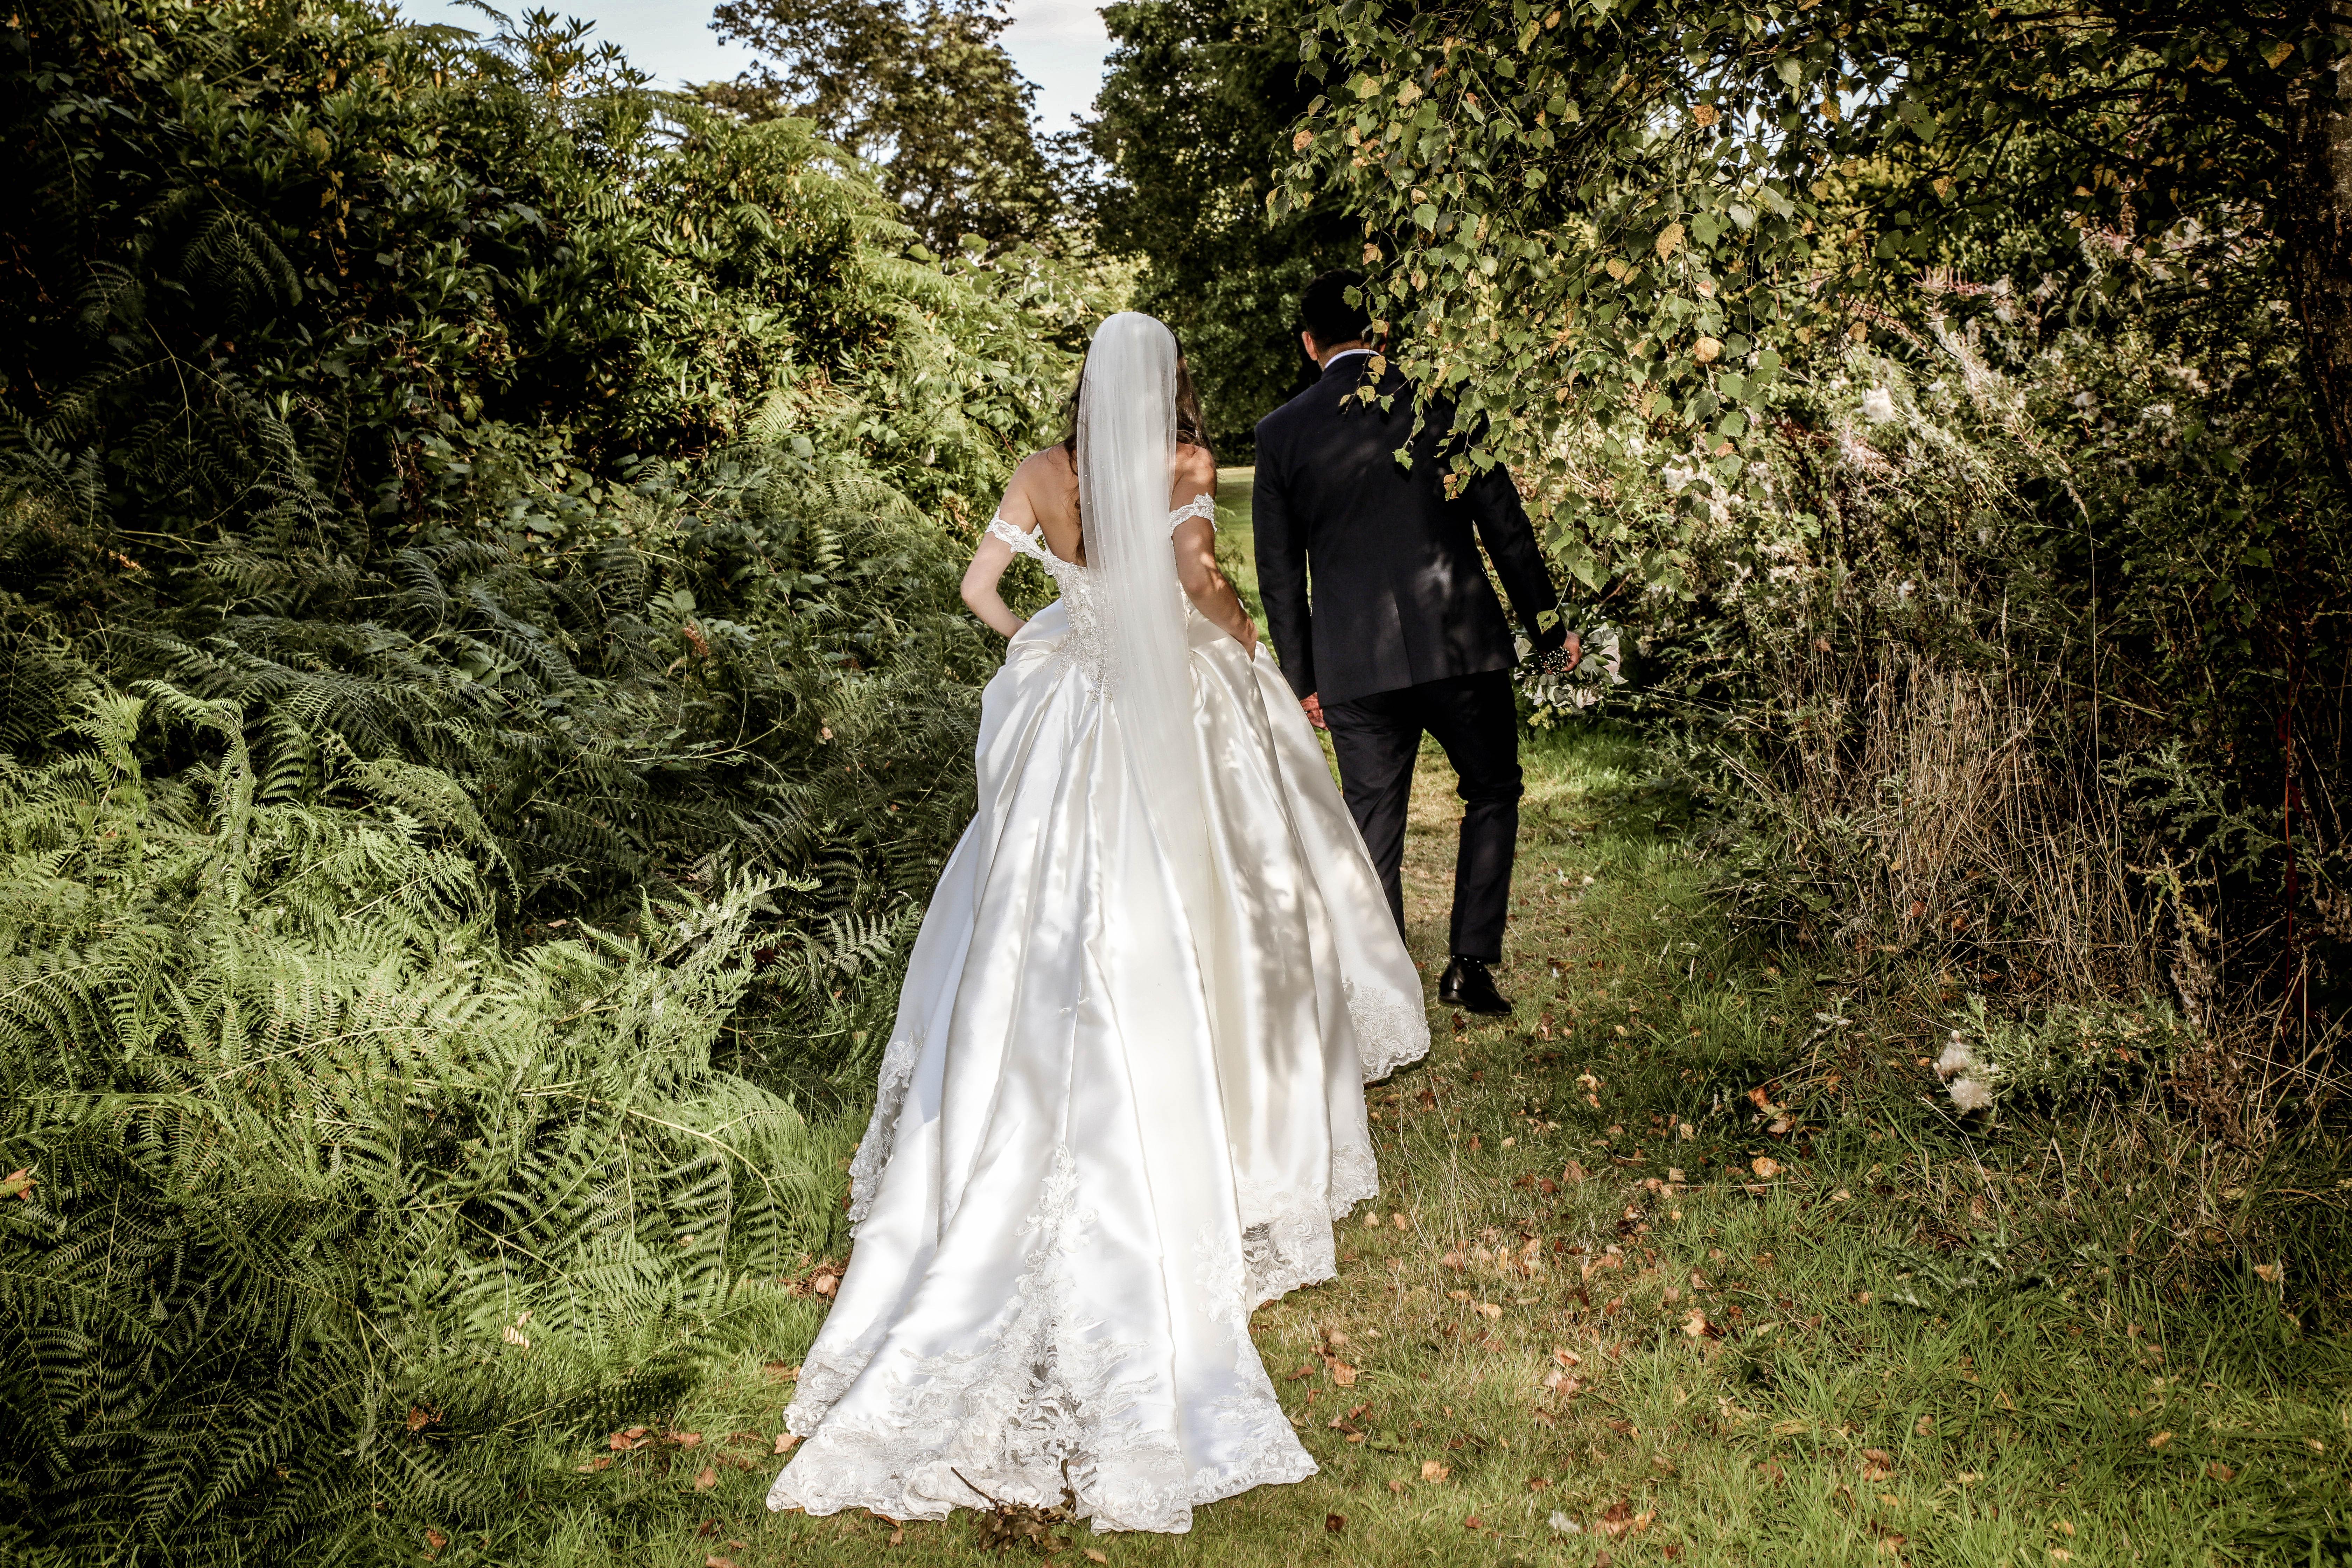 ArtbyClaire Wedding Photography at Shendish Manor Wedding Fair sunday 5th January 2020